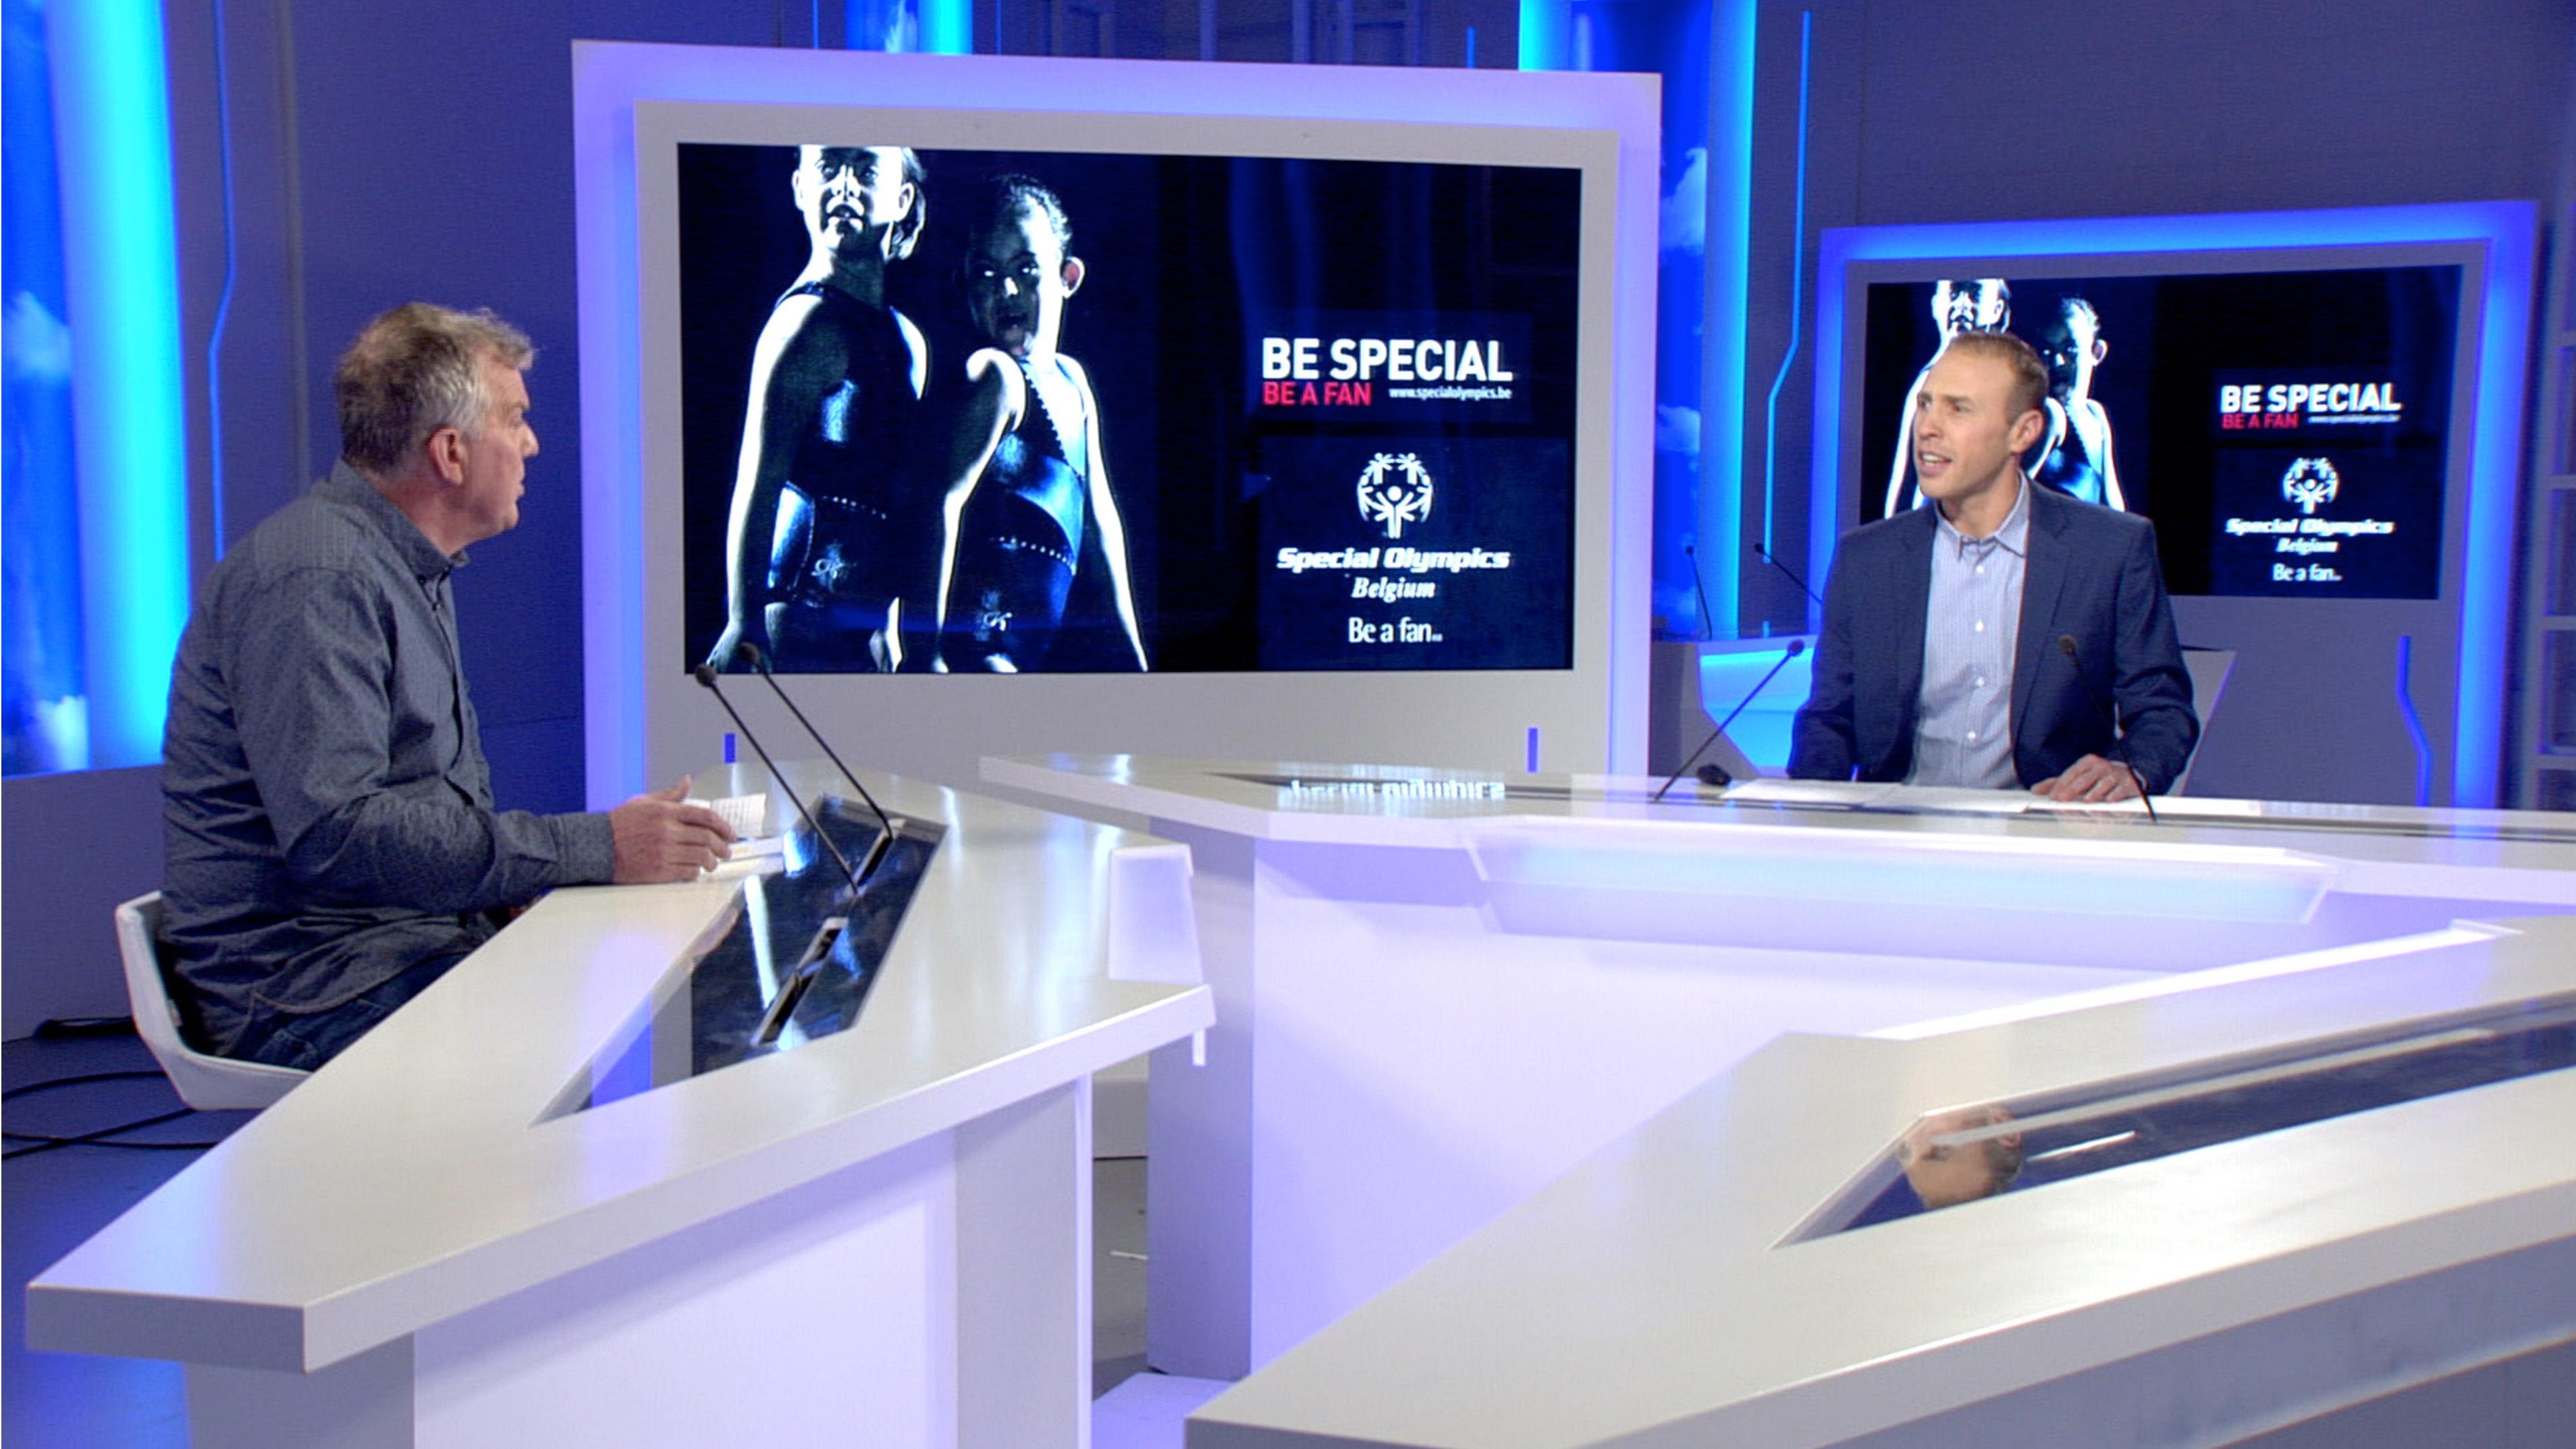 Présentation des Special Olympics Belgium